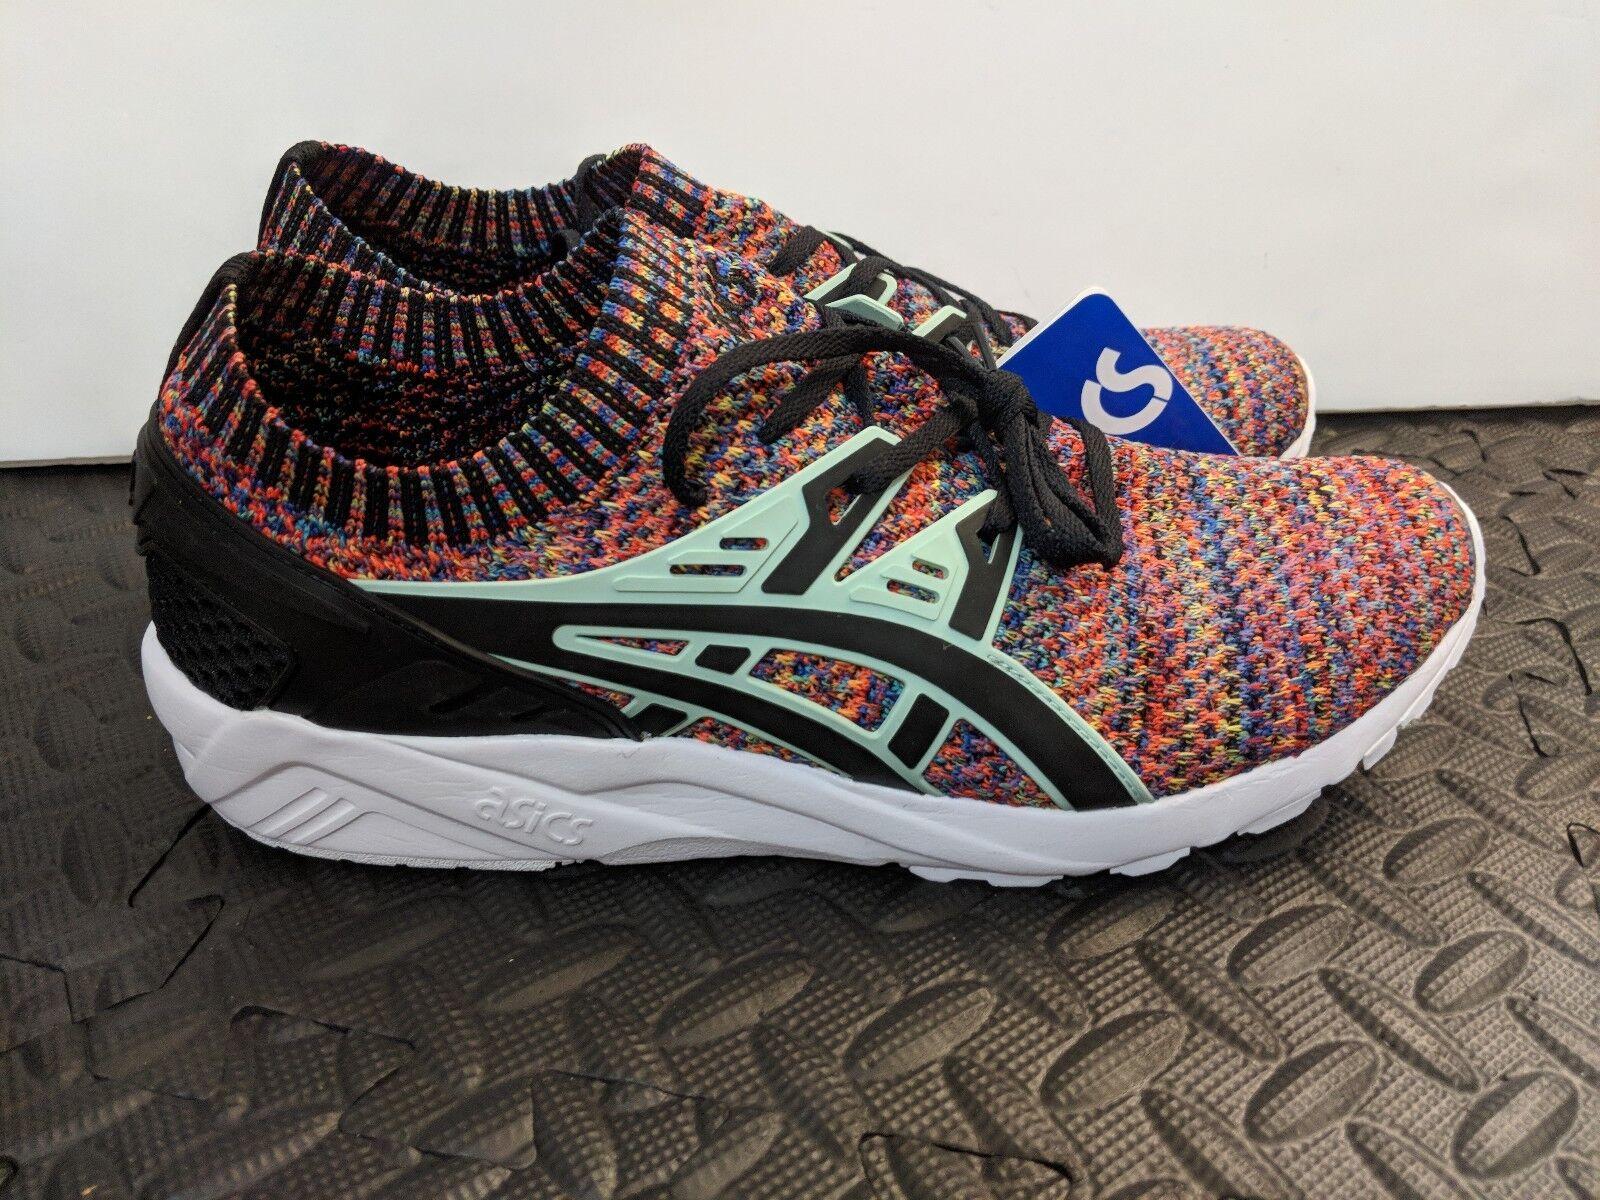 NEW ASICS Tiger Men's GEL Kayano Trainer Running Knit shoes Size 9 HN7Q4